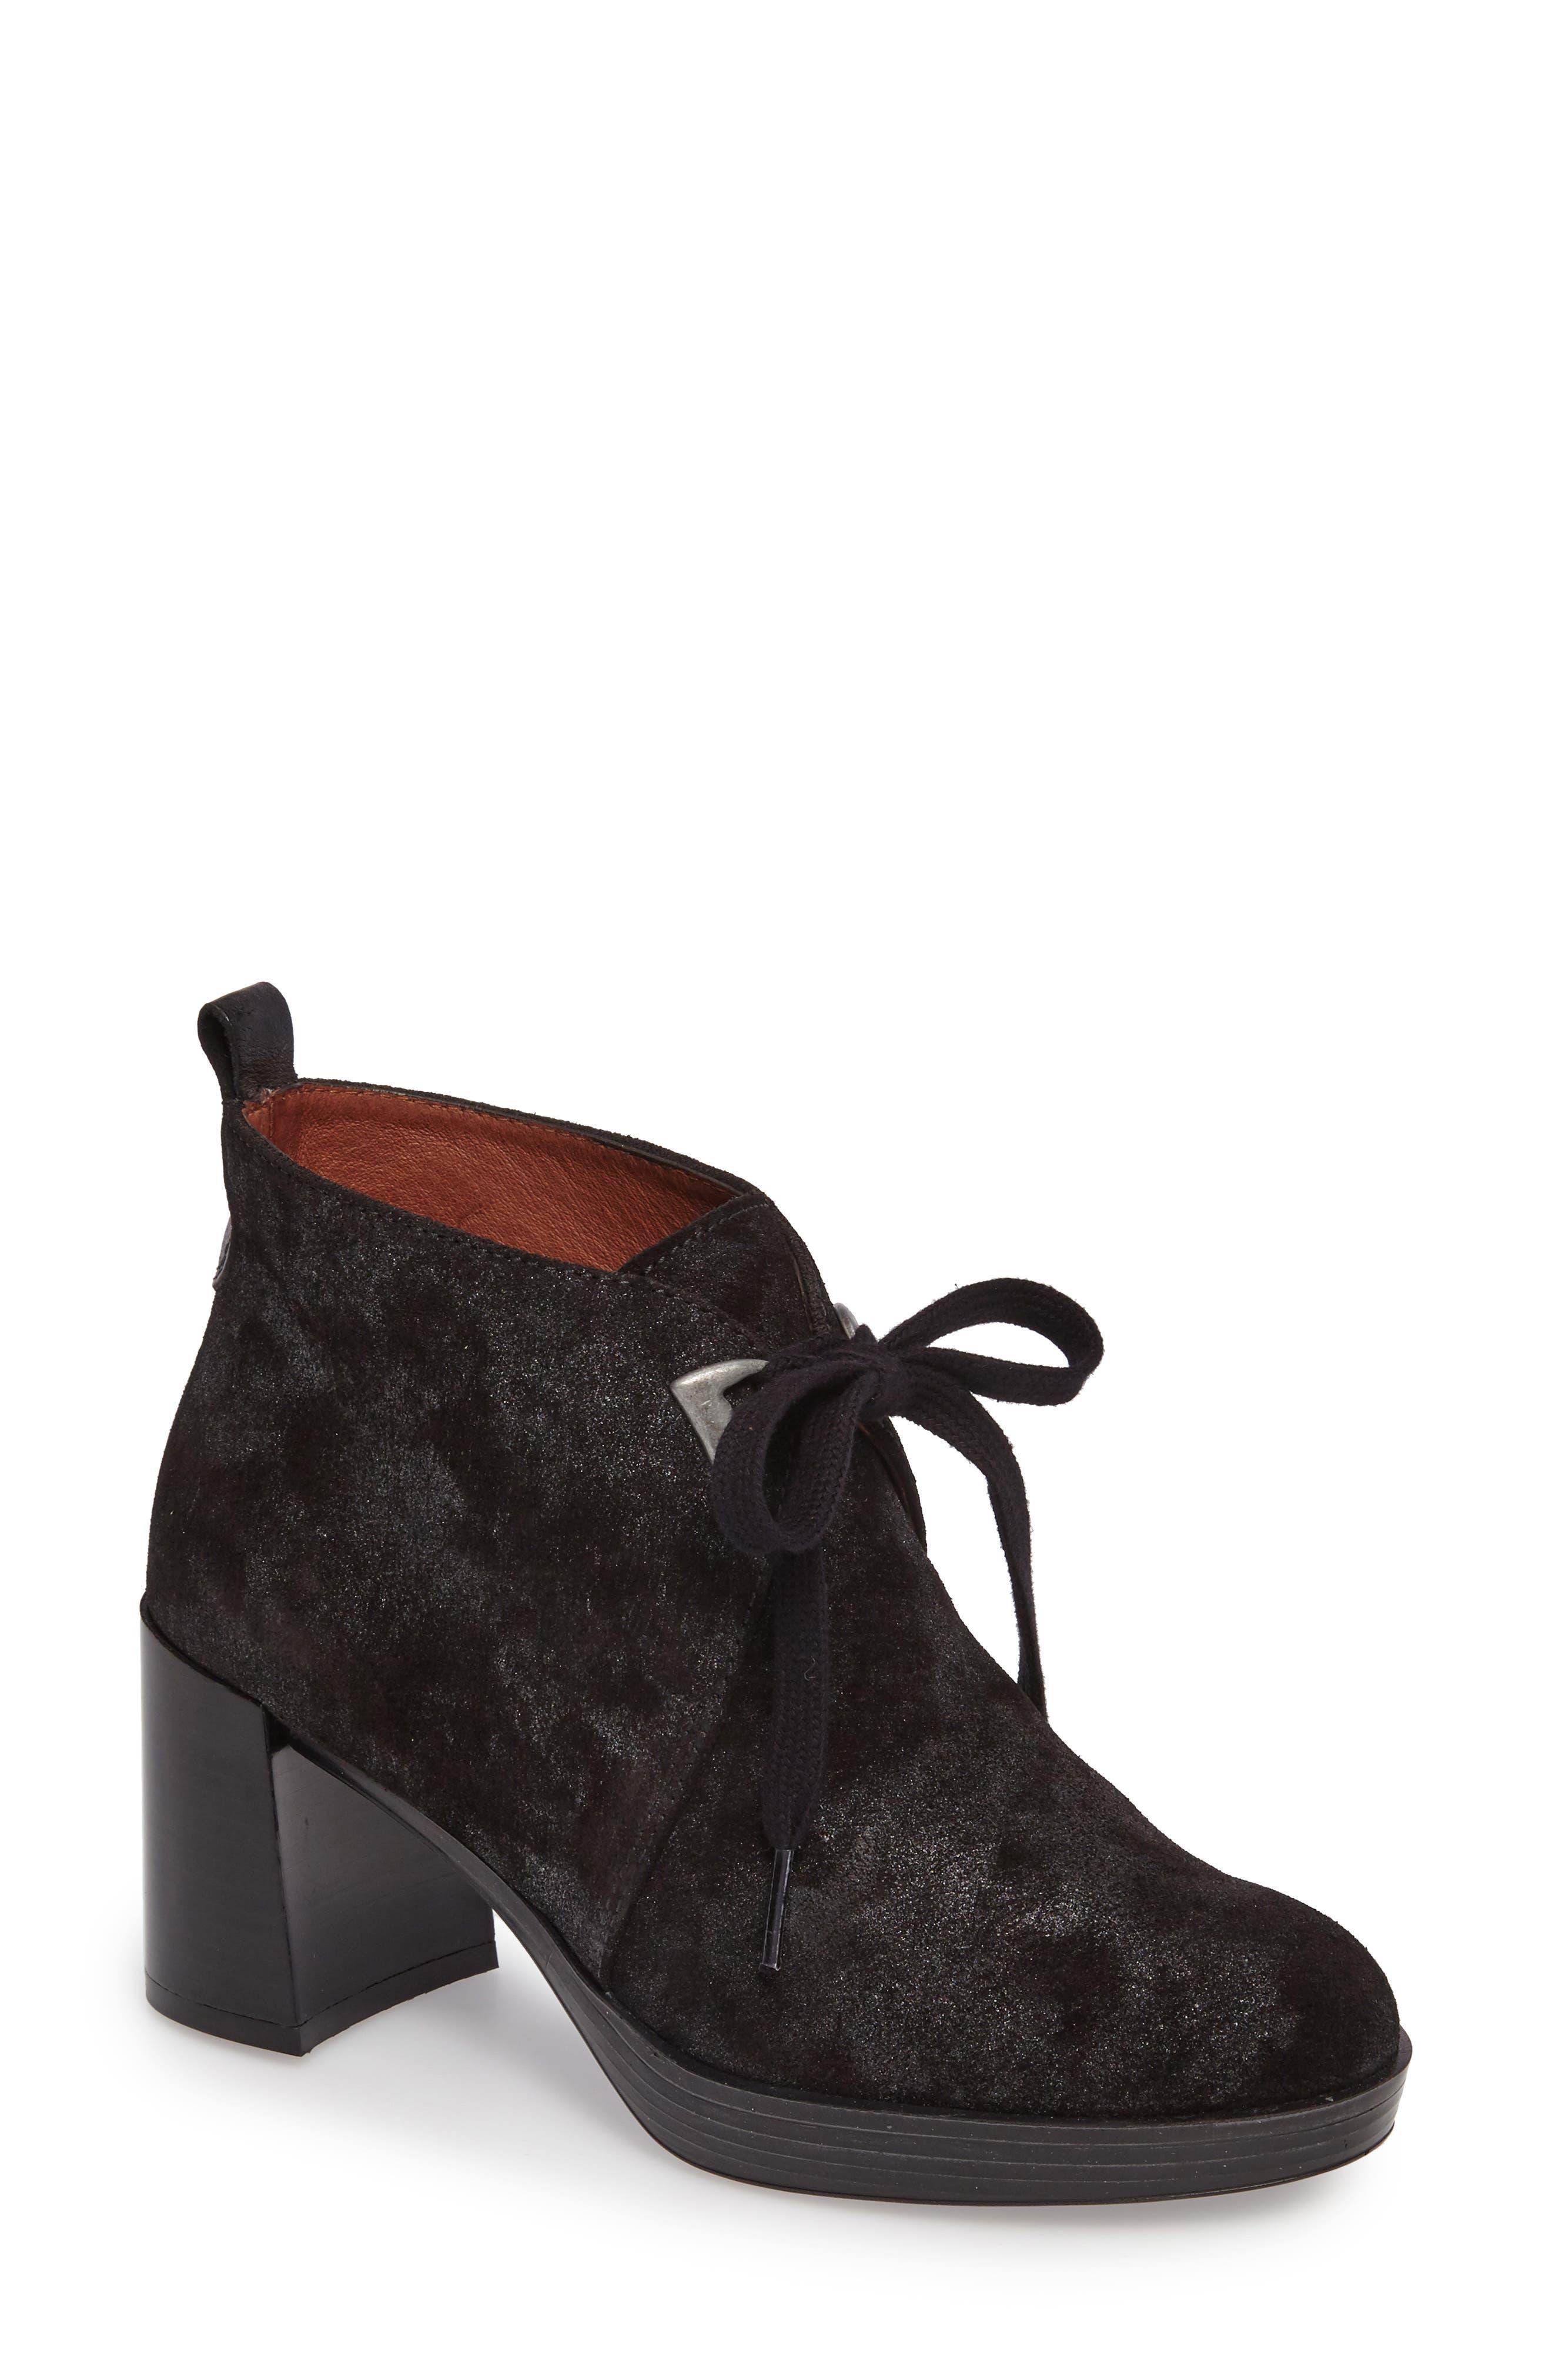 Dasia Bow Bootie,                             Main thumbnail 1, color,                             Brut Black Leather